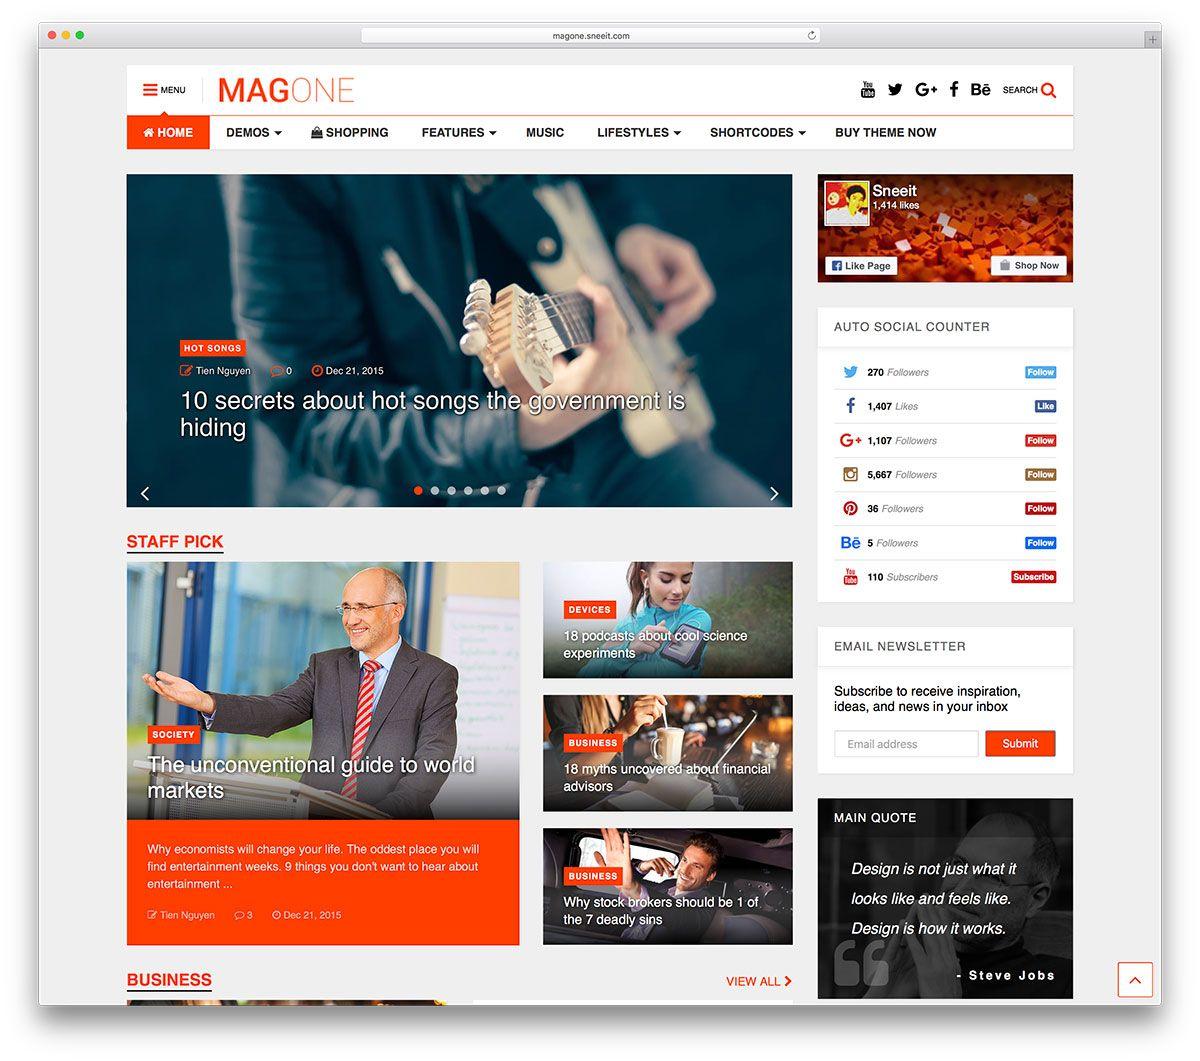 magone-creative-magazine-wordpress-theme | Themes for Website ...